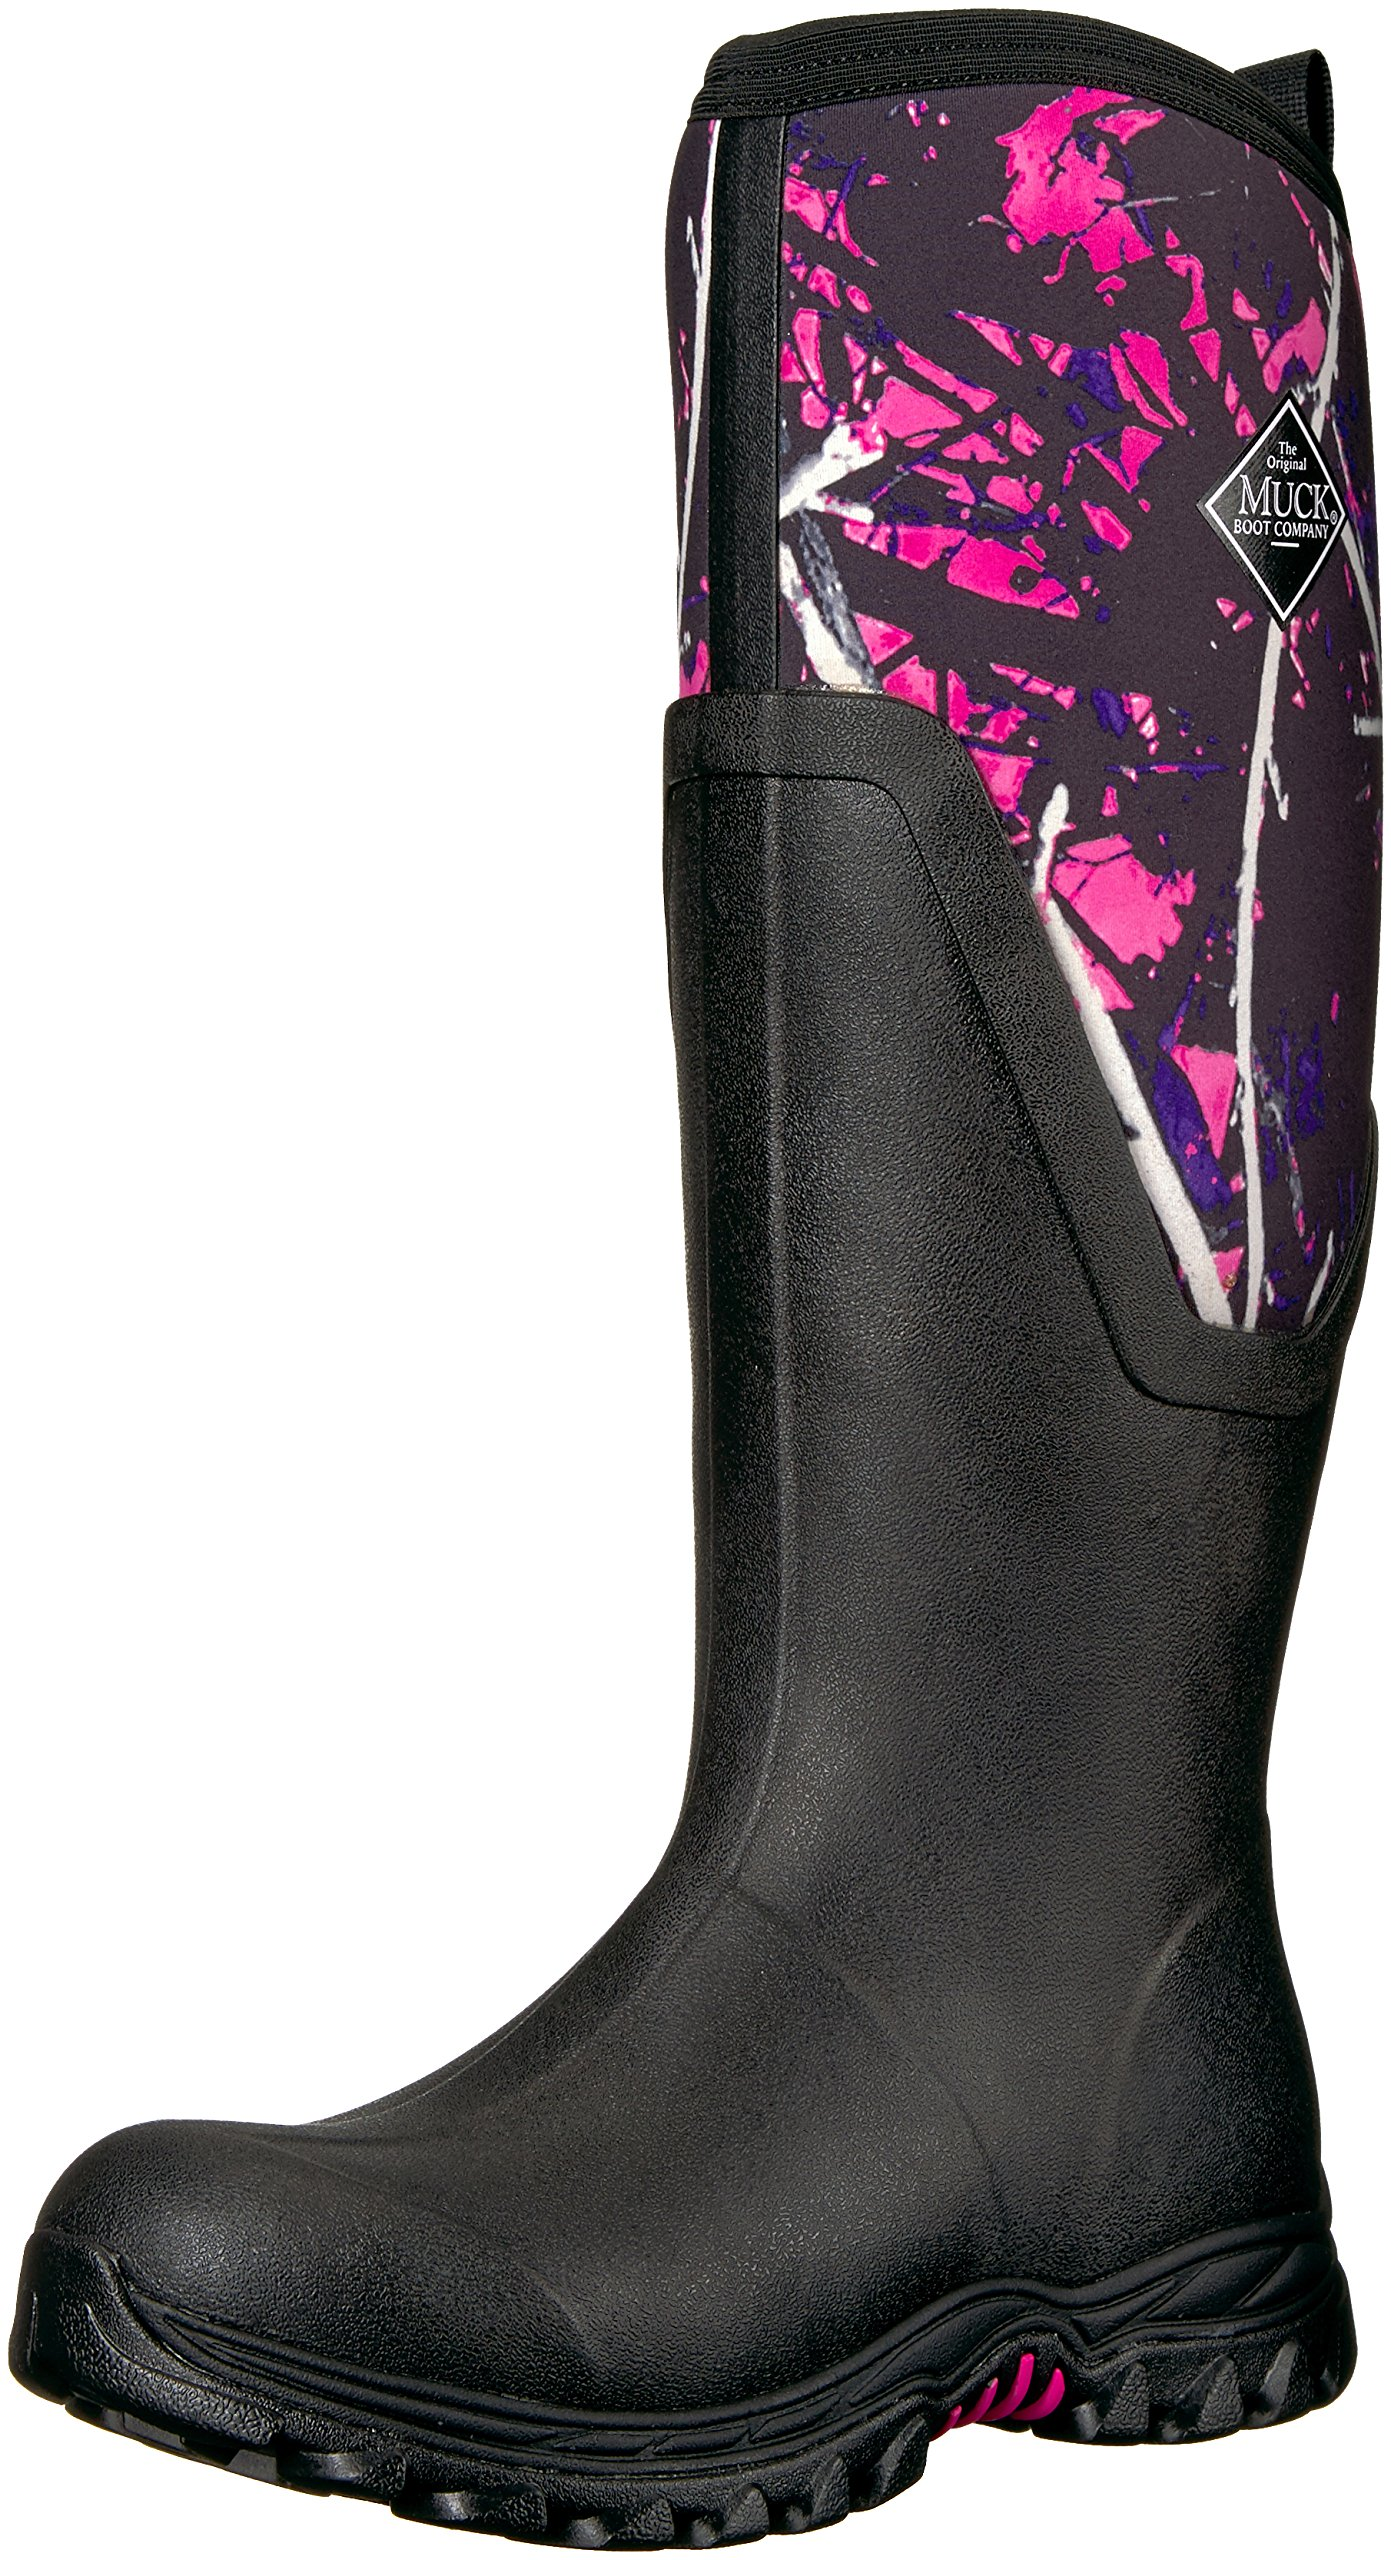 Muck Boot Women's Arctic Sport II Tall Work Boot, Black/Muddy Girl, 7 M US